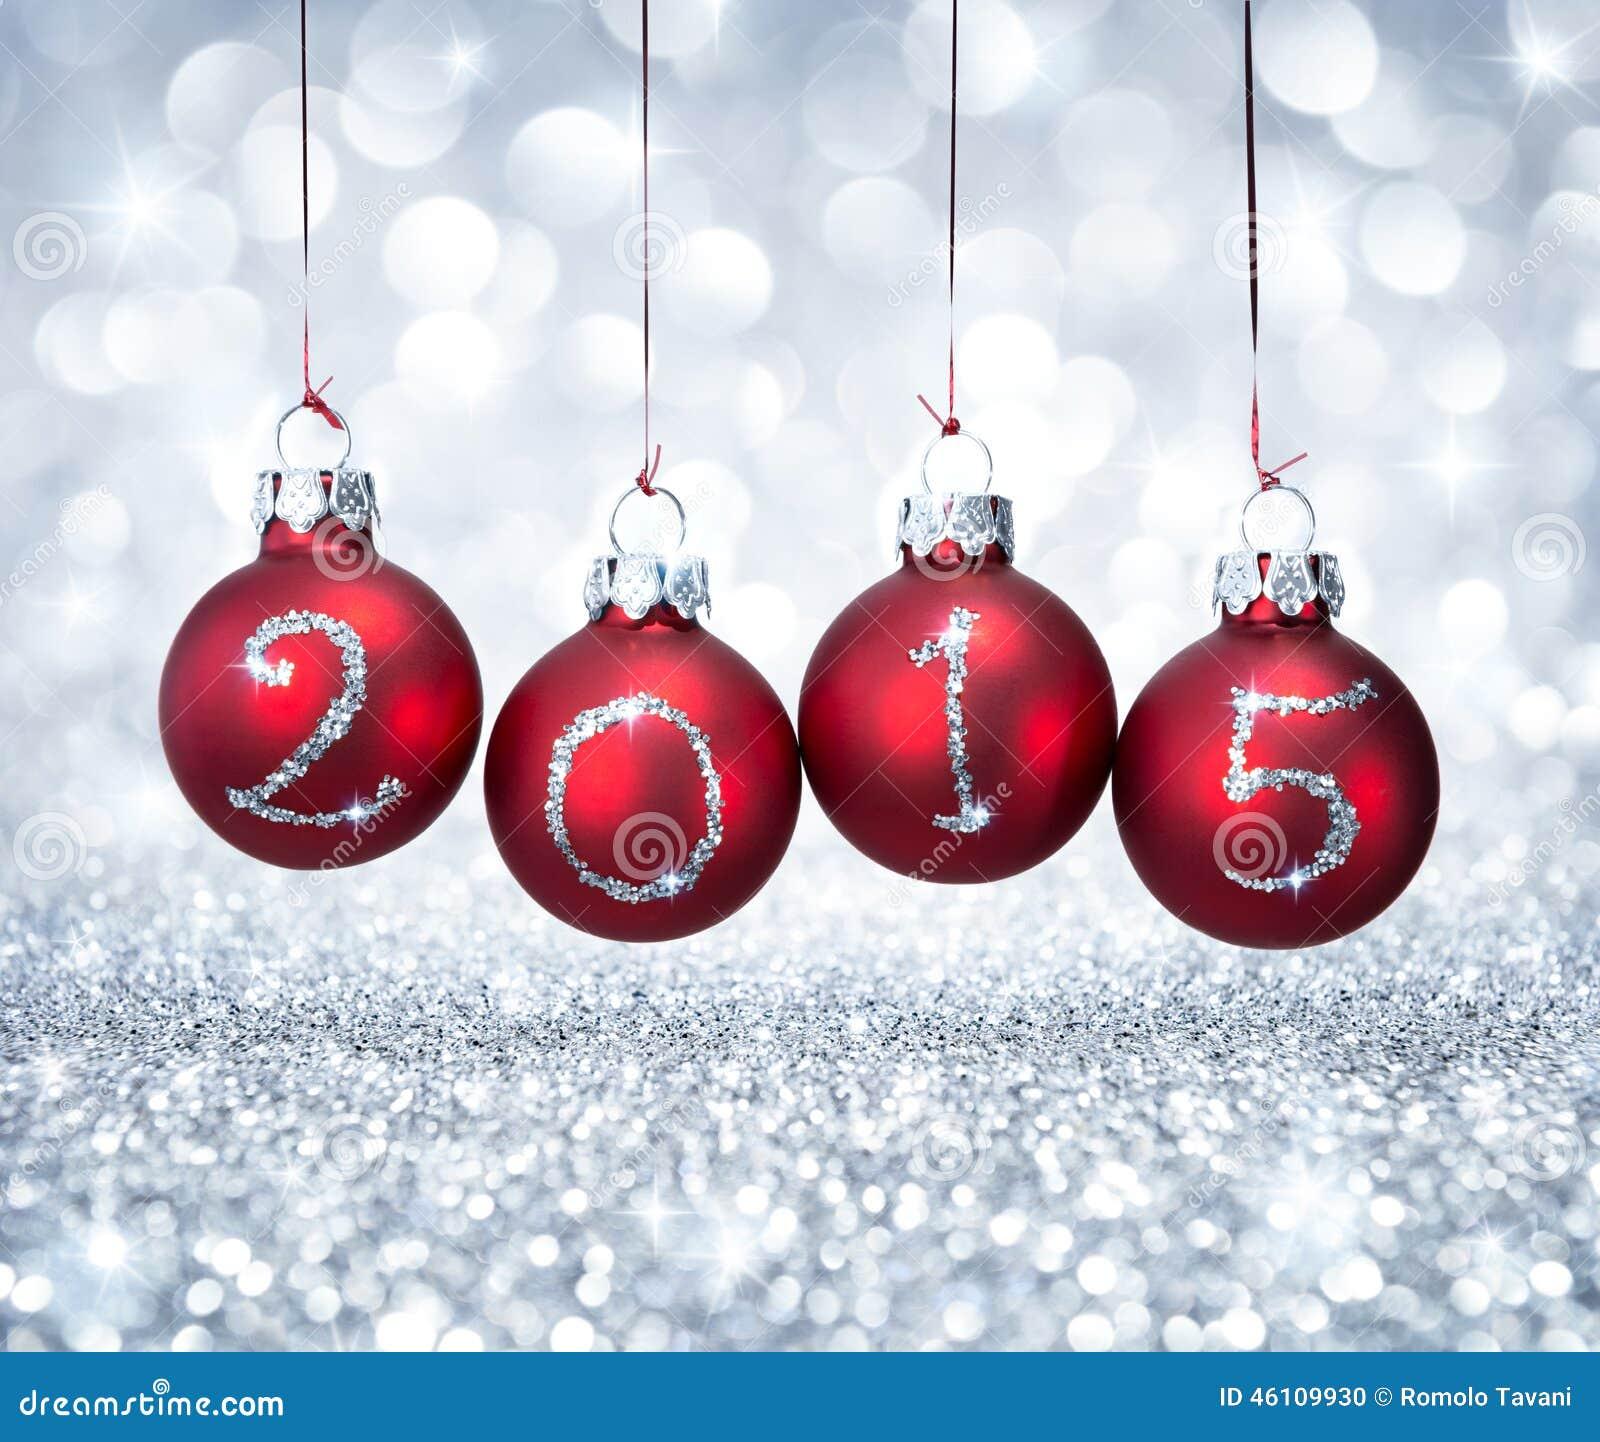 New Year Celebration Plans